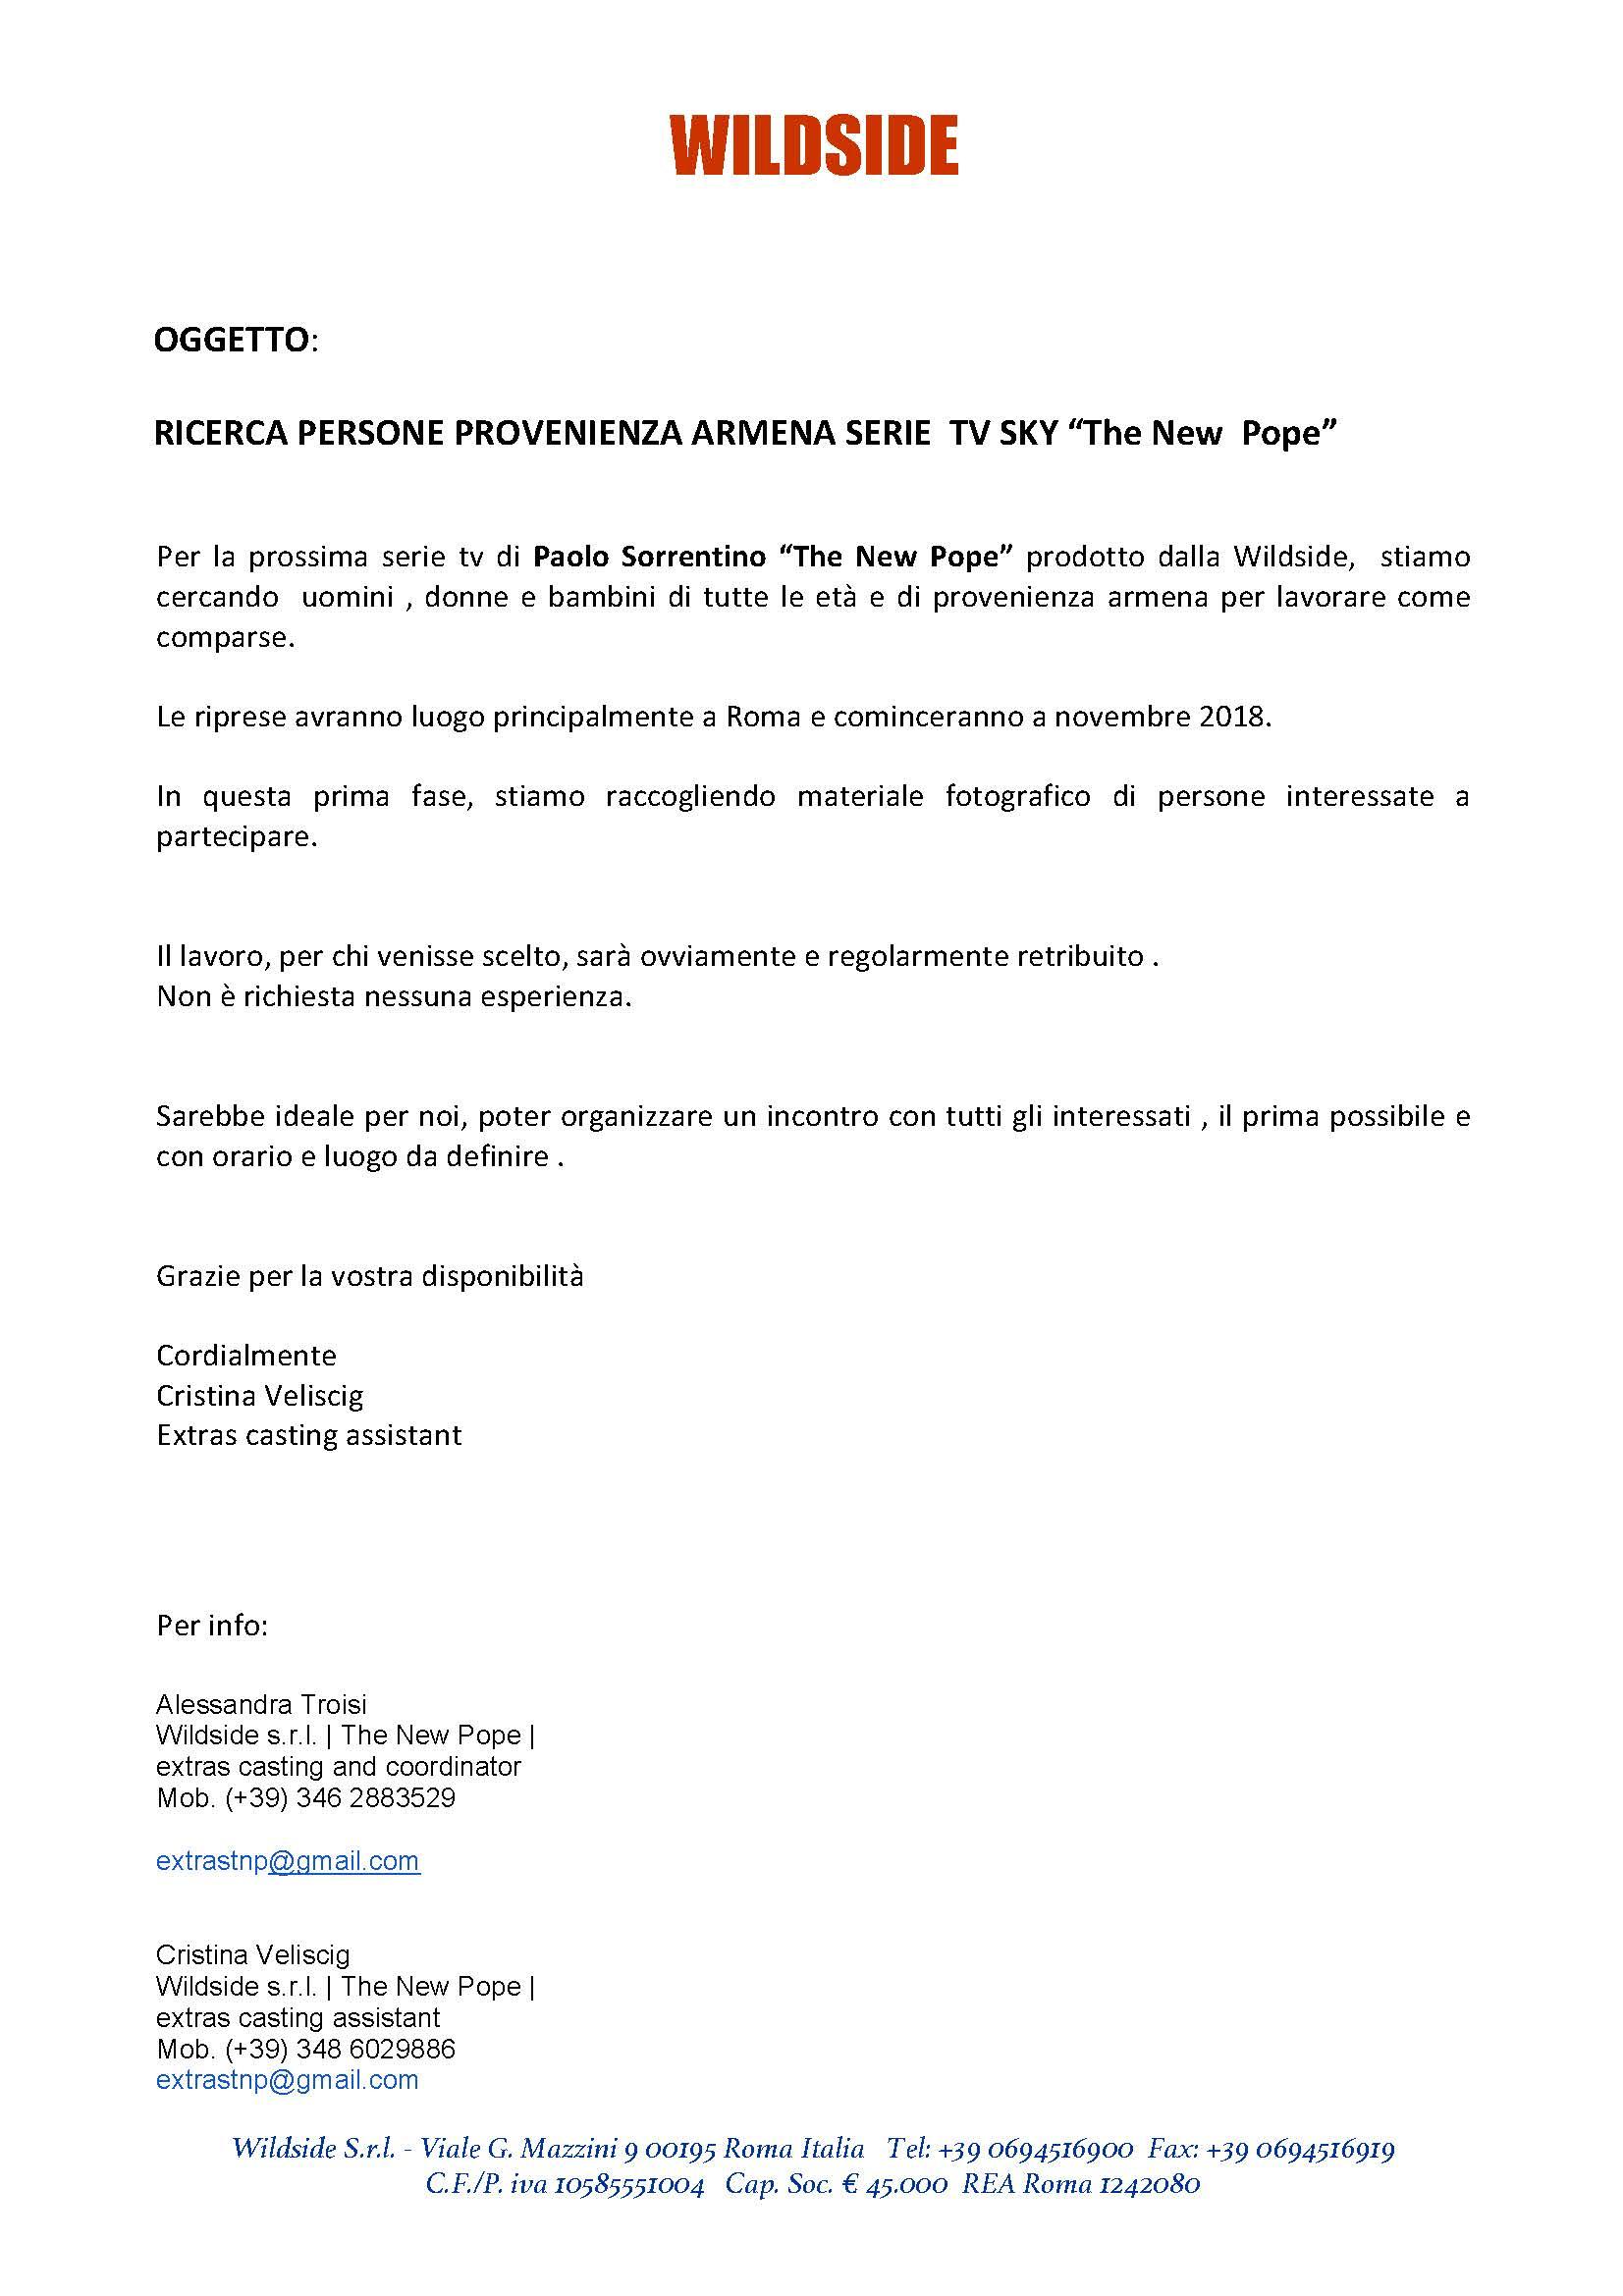 tnp_comunicato-armeni-3